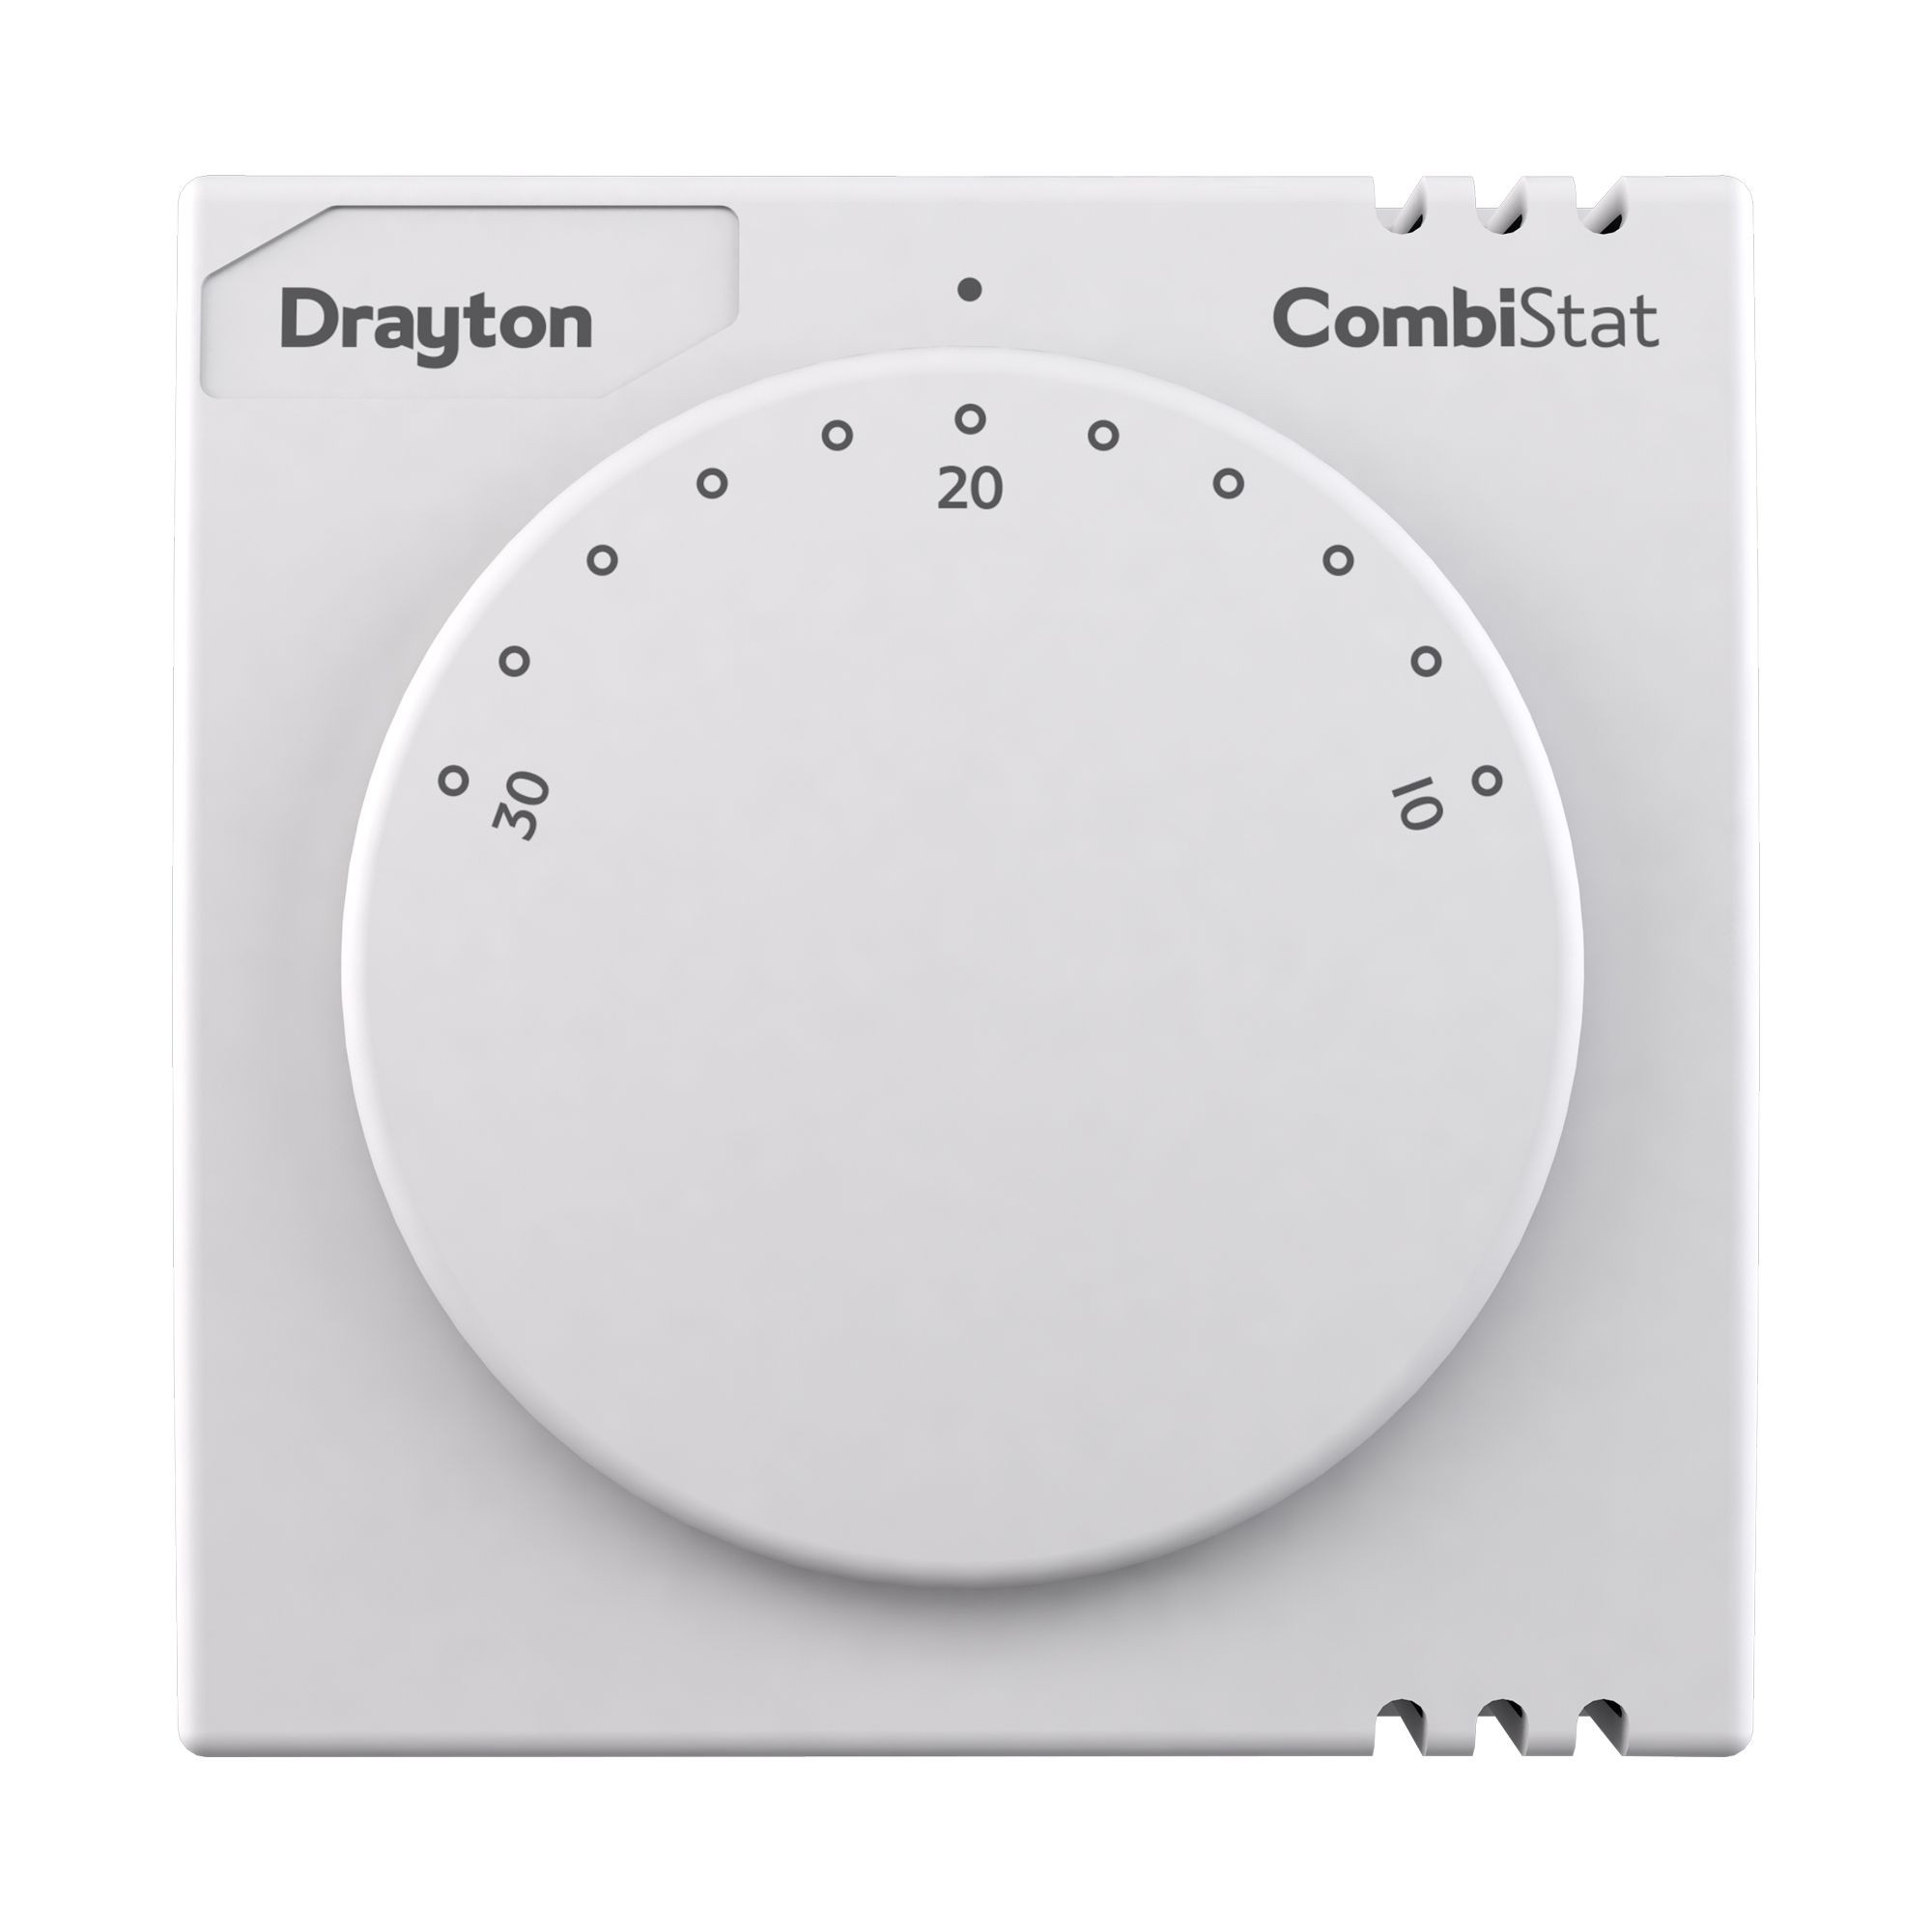 drayton room thermostat wiring diagram painless 66 mustang combi departments diy at b andq